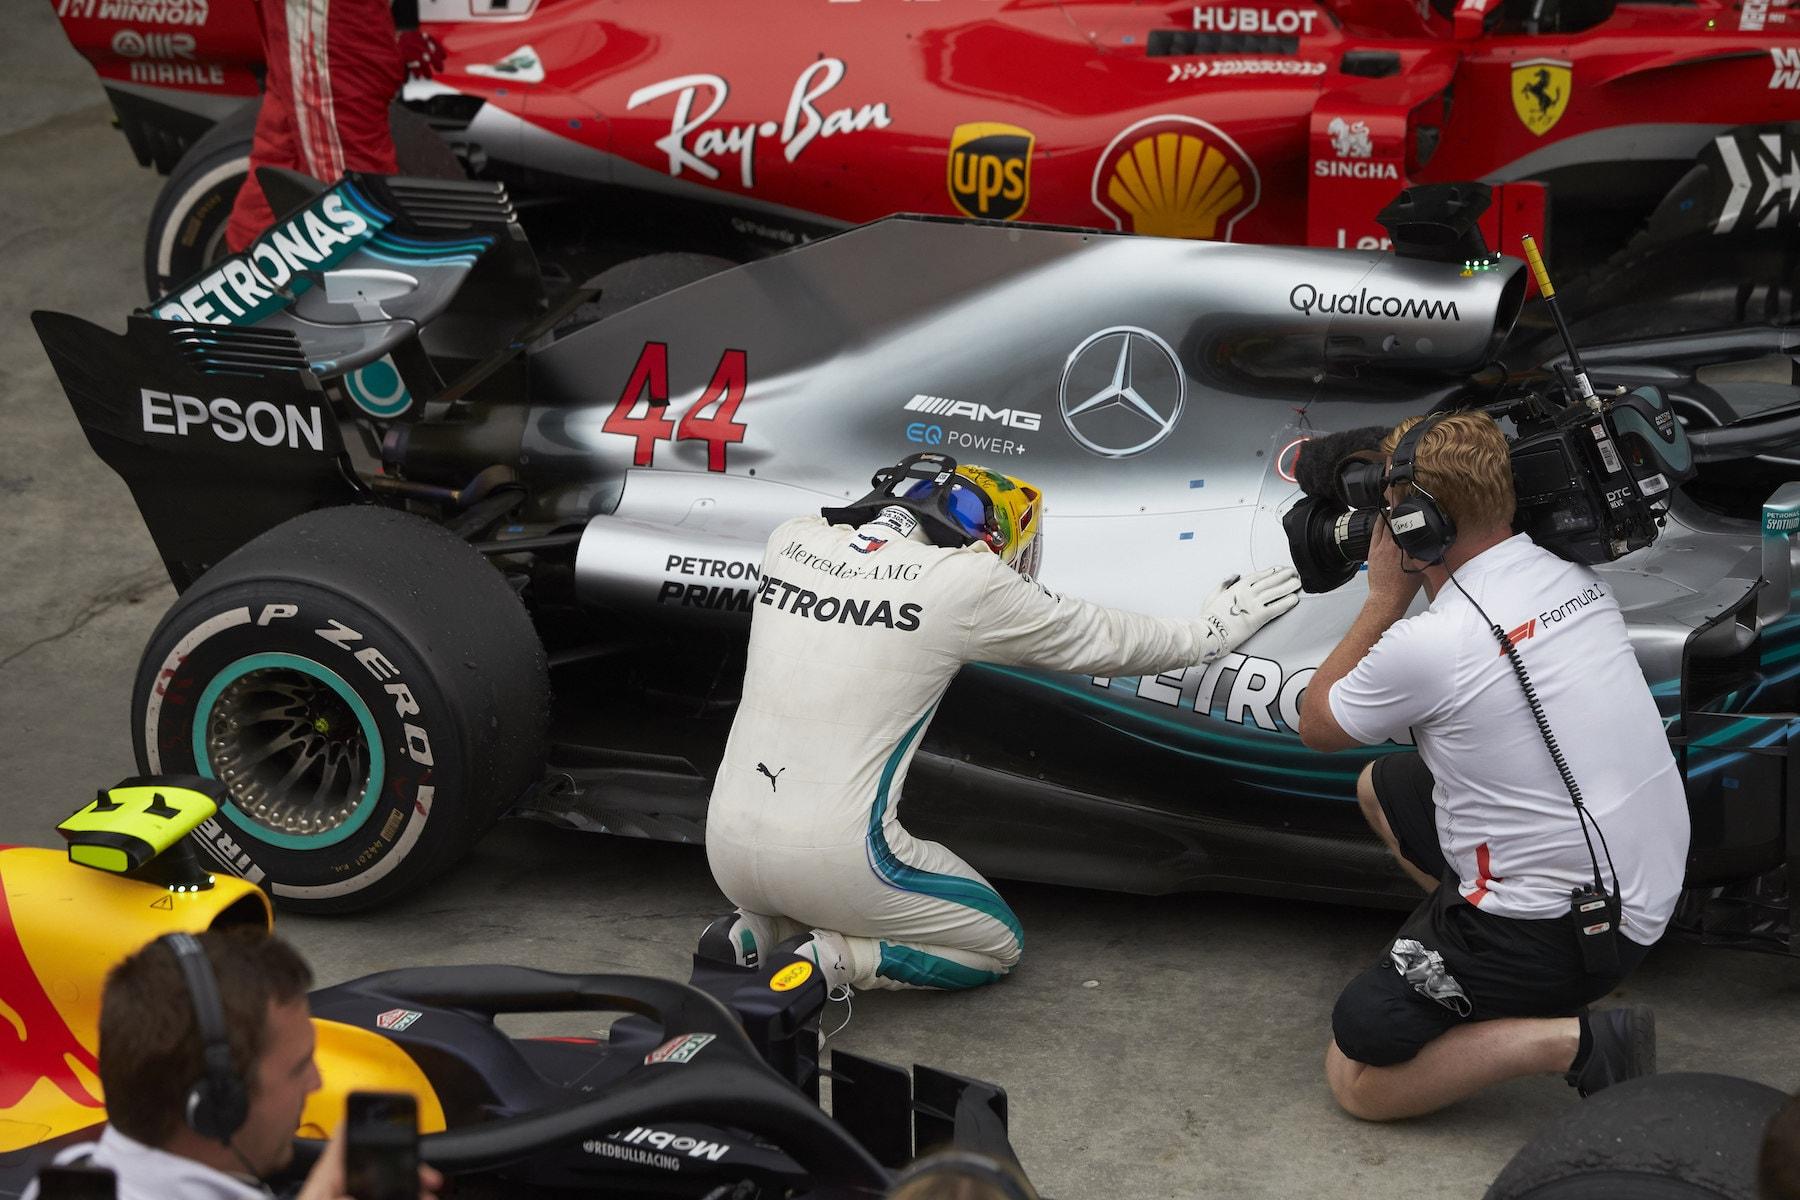 R 2018 Lewis Hamilton | Mercedes W09 | 2018 Brazilian GP winner 4 copy.JPG